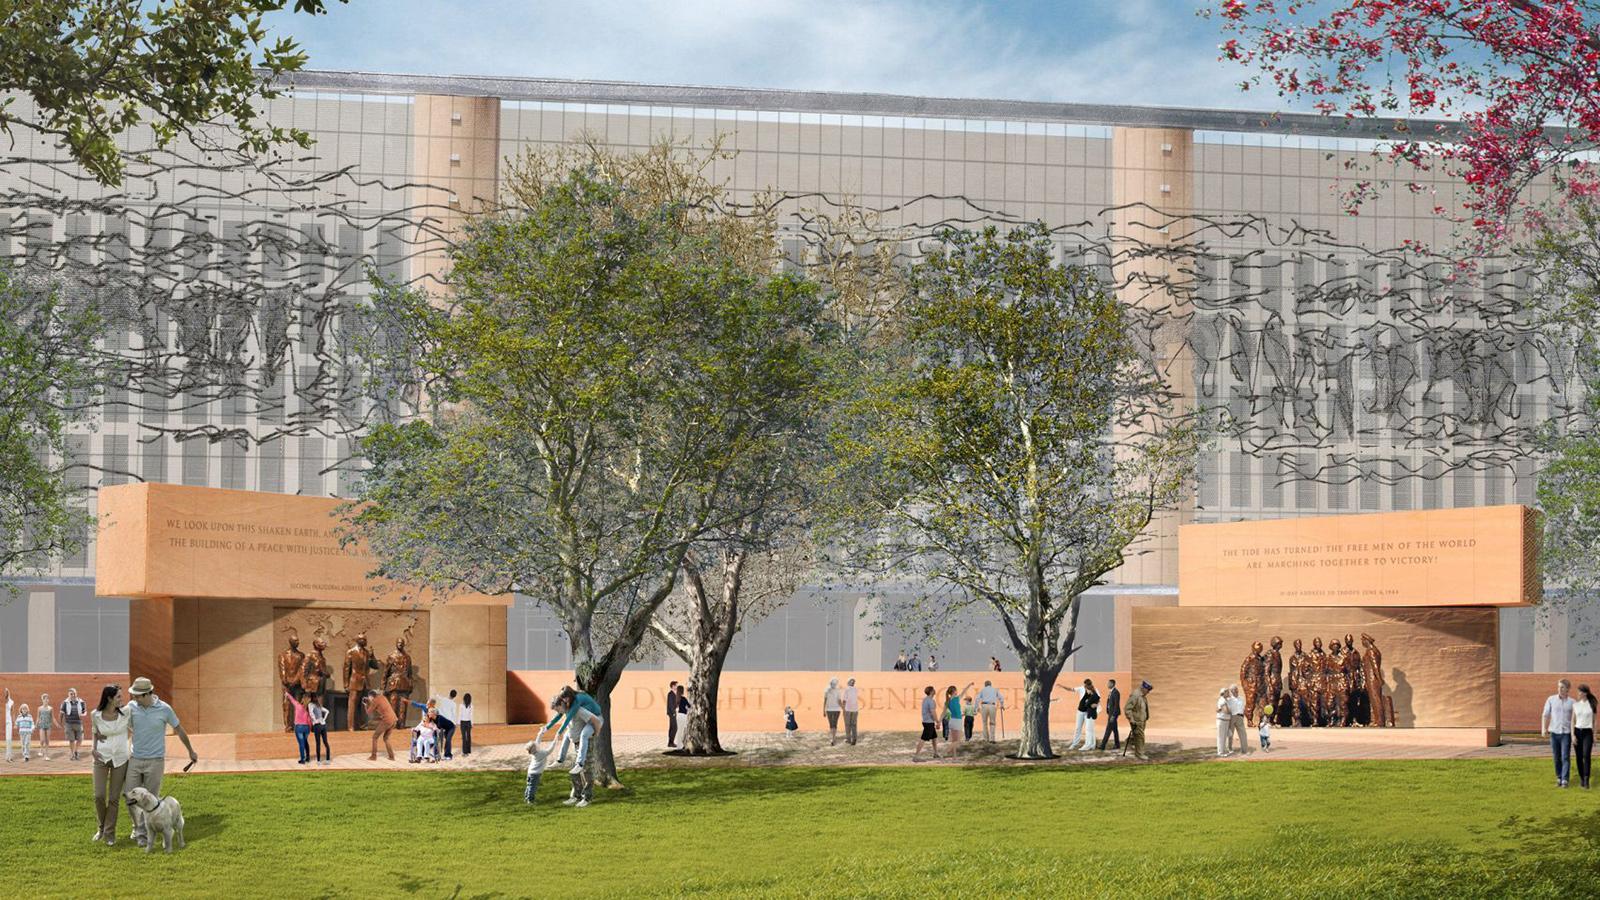 Frank Gehry's Eisenhower Memorial